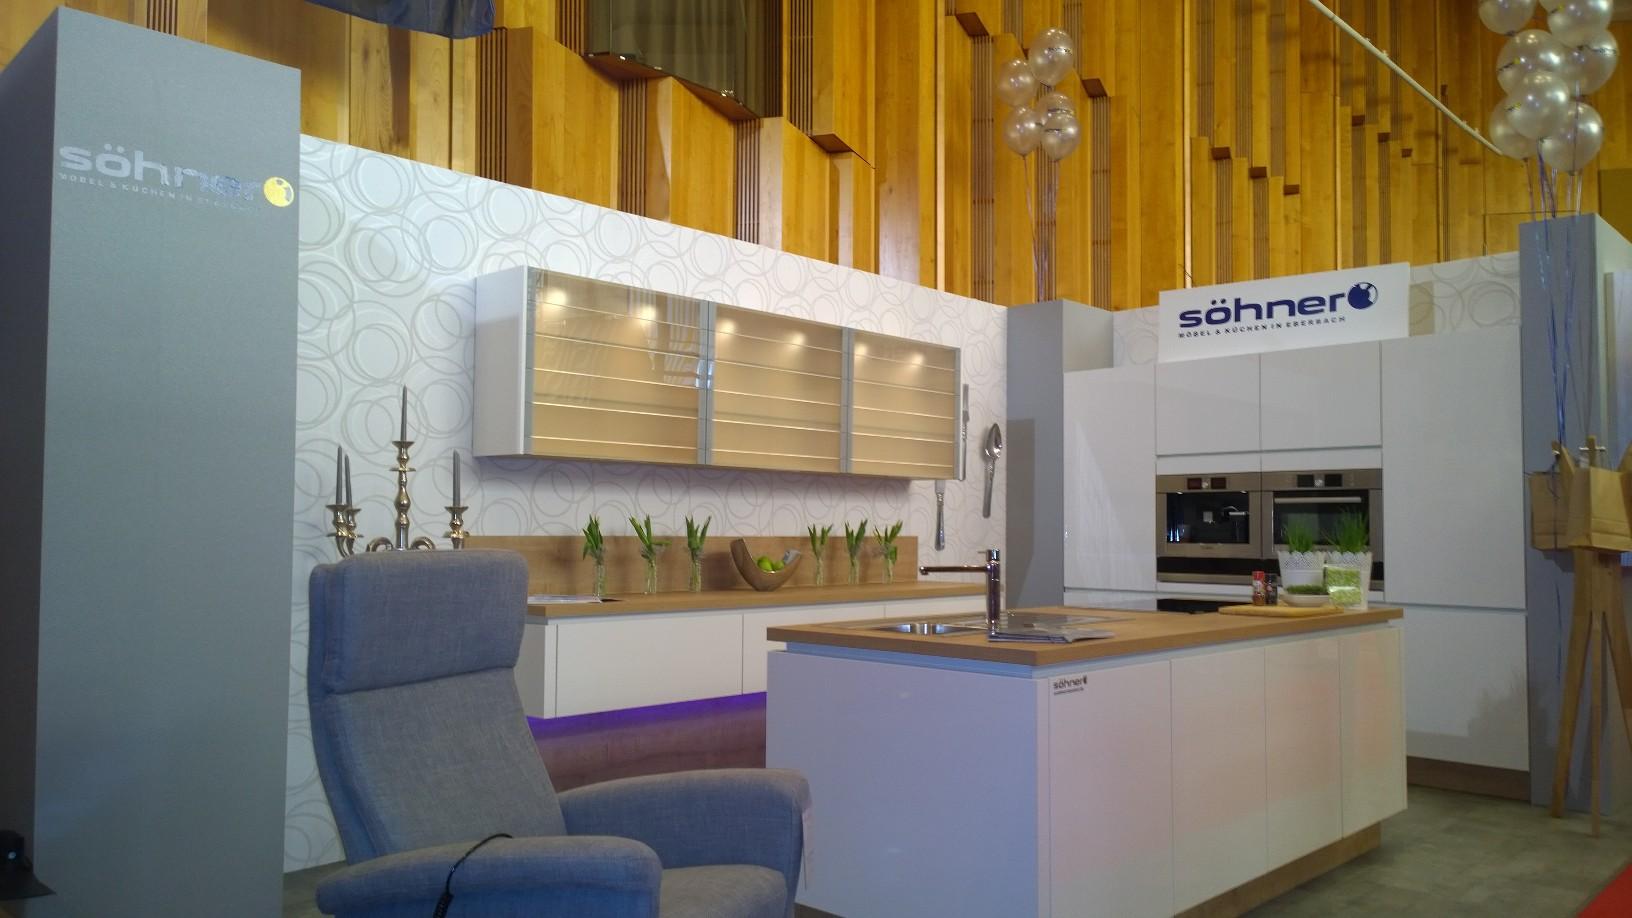 s hner m bel und k chen in eberbach aktionen. Black Bedroom Furniture Sets. Home Design Ideas